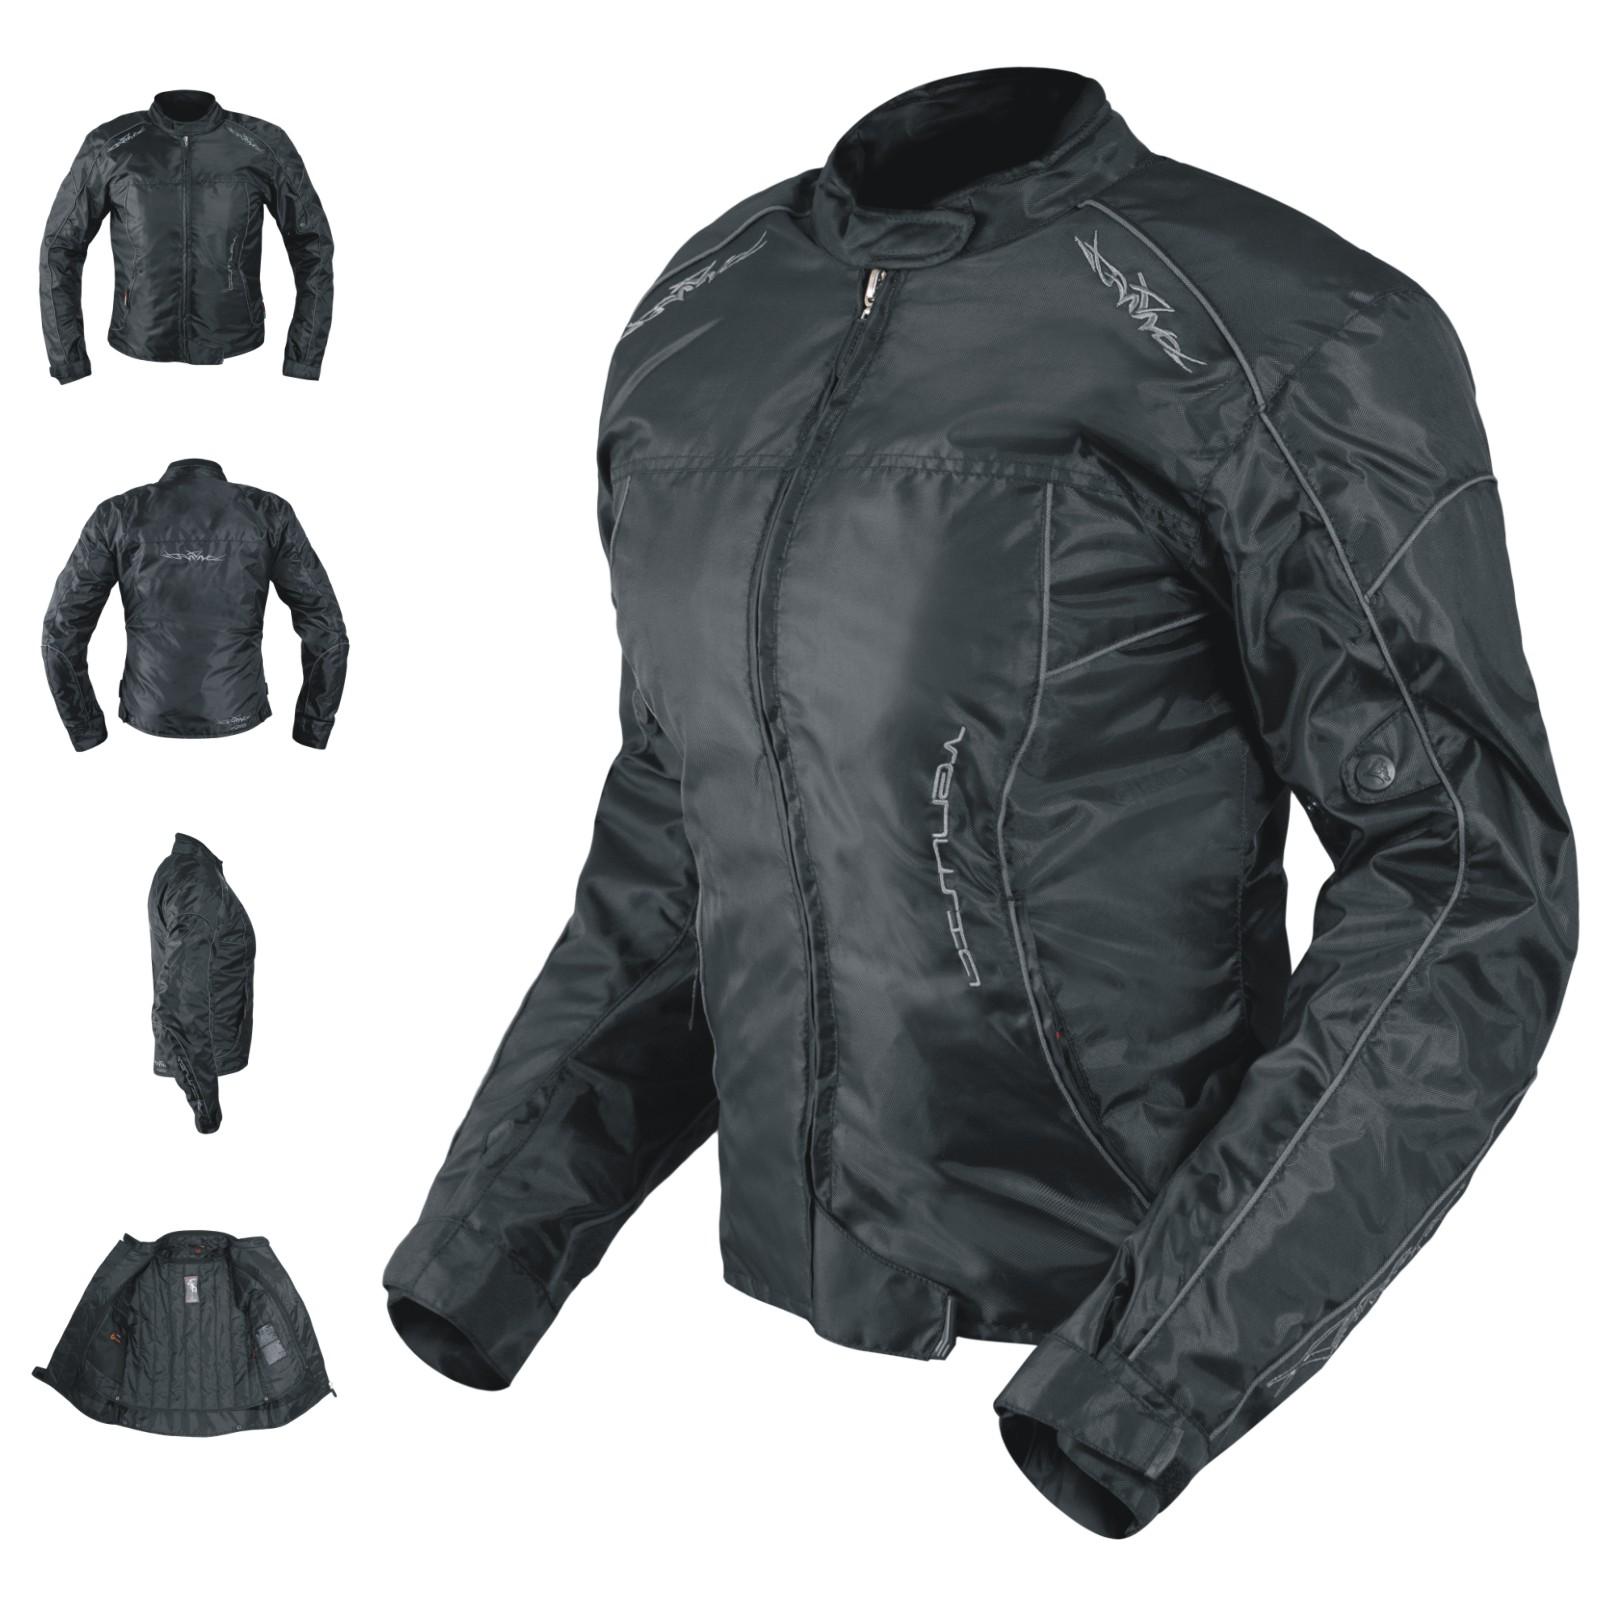 Veste-Blouson-Femme-Moto-Nylon-Oxford-Gilet-Thermique-Protections-Reflechissant